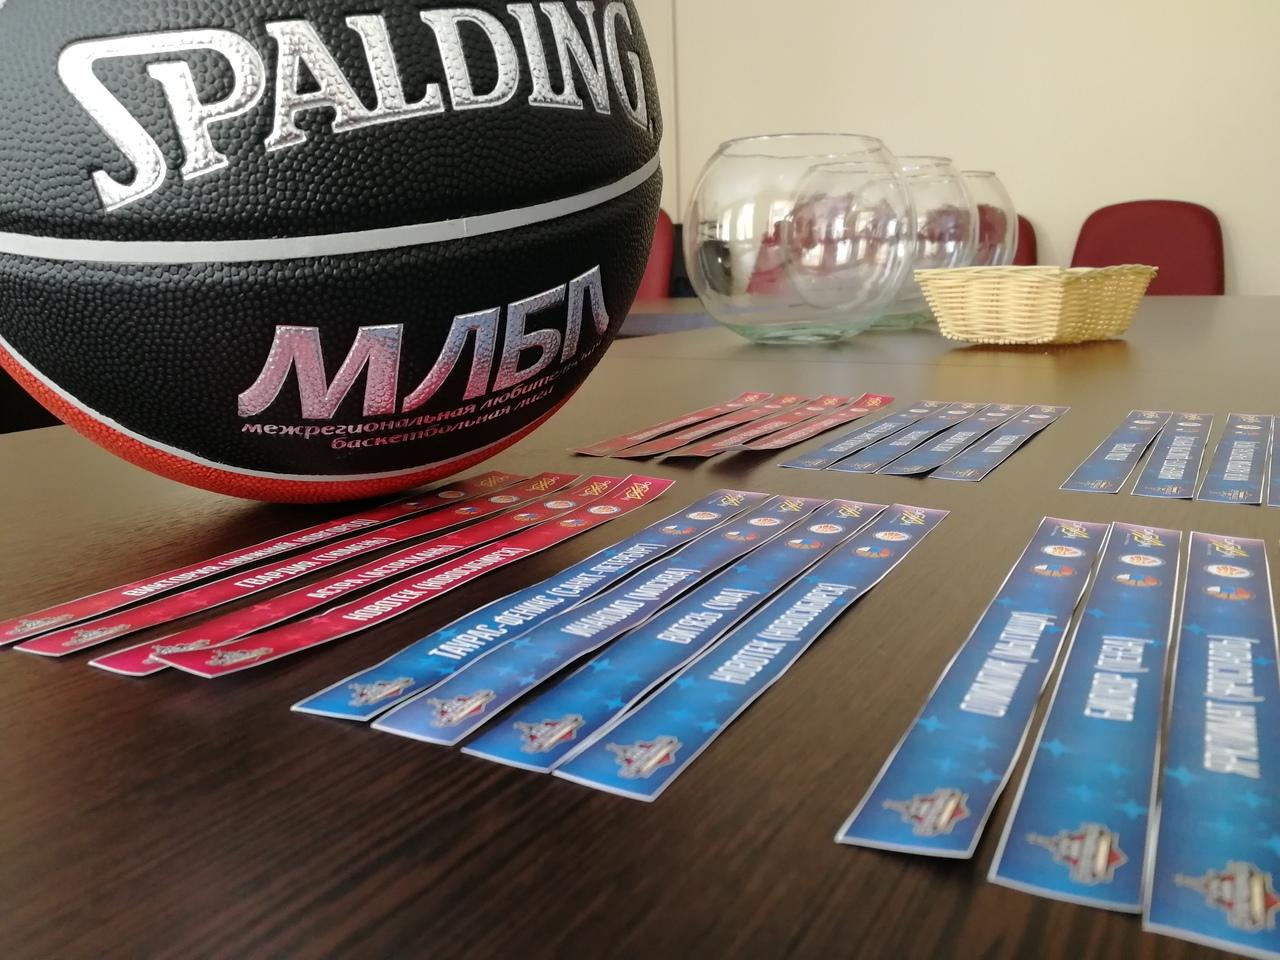 В Доме Баскетбола состоялась жеребьевка Inanomo Суперфинала МЛБЛ 2018